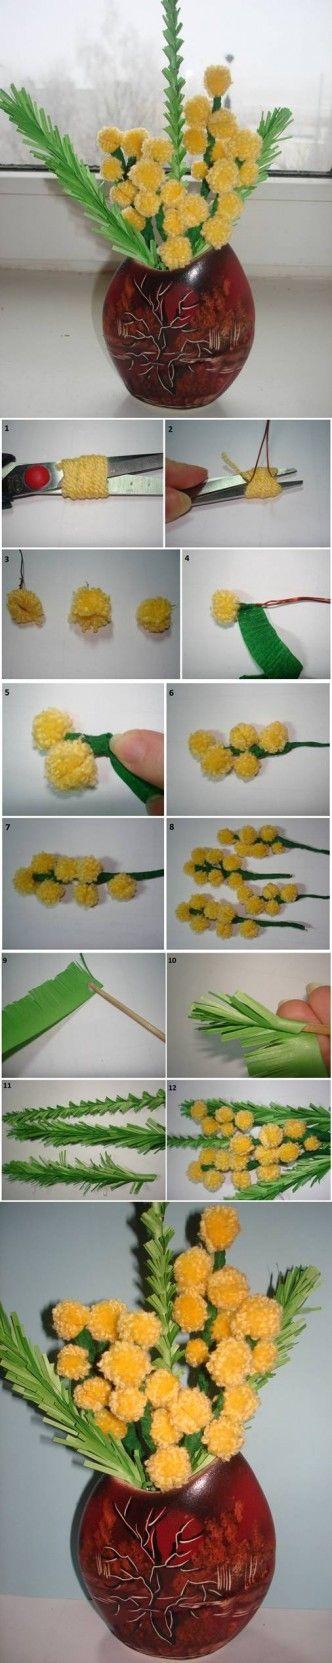 DIY Mimosa Flower Bouquet DIY Projects